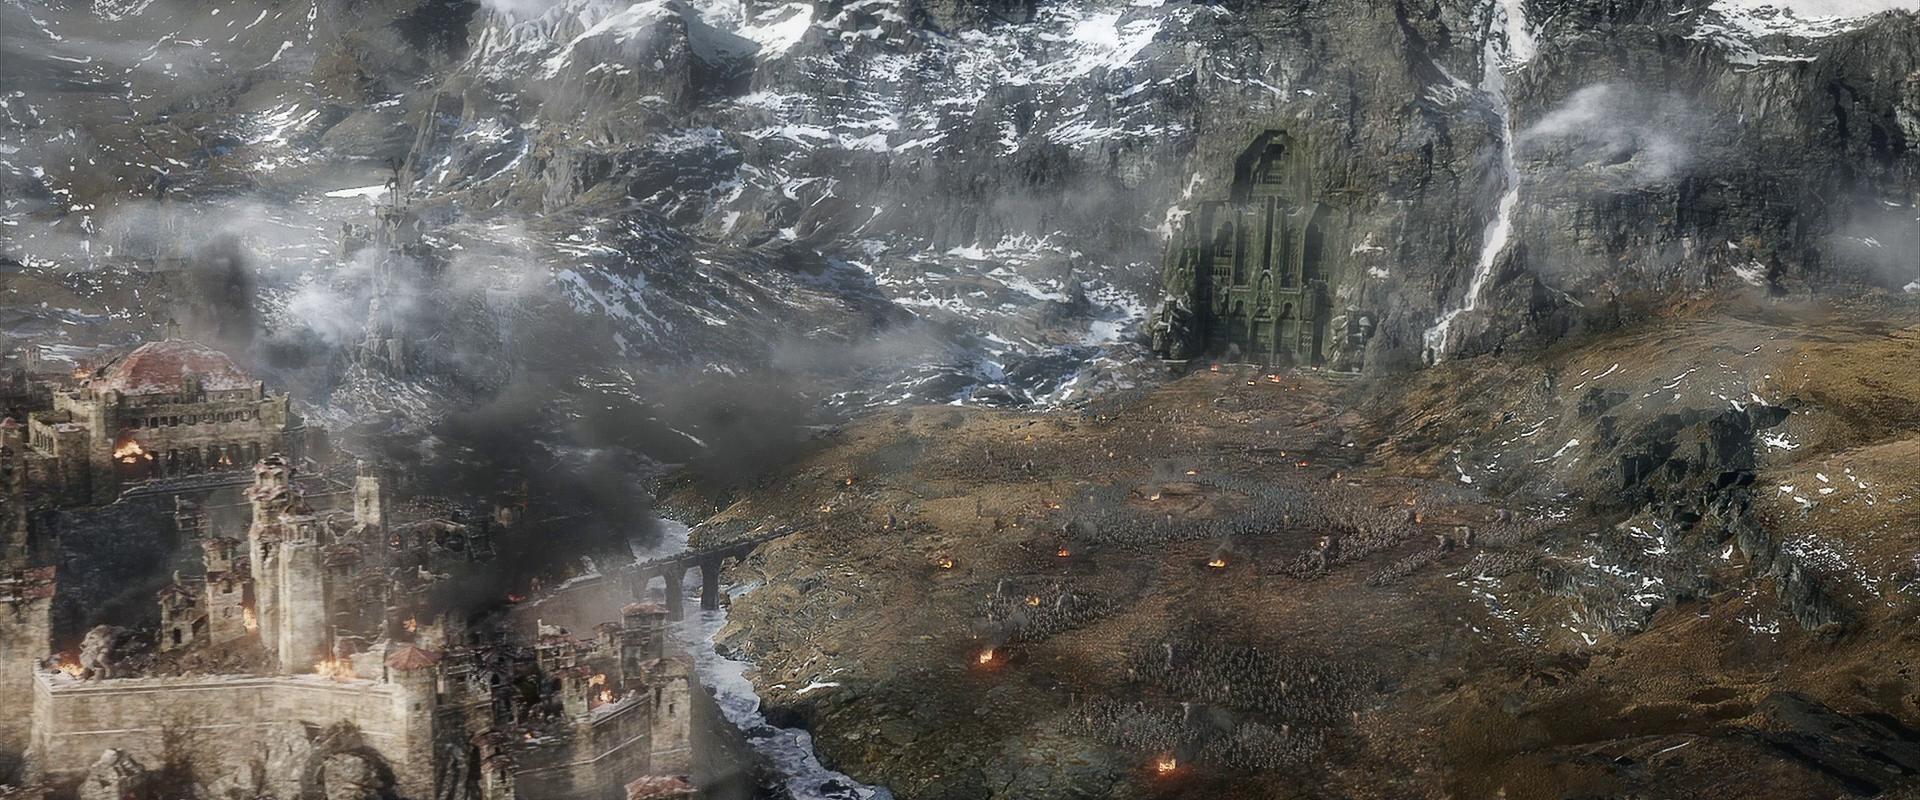 Battle Of Five Armies Peter Jackson S The Hobbit Wiki